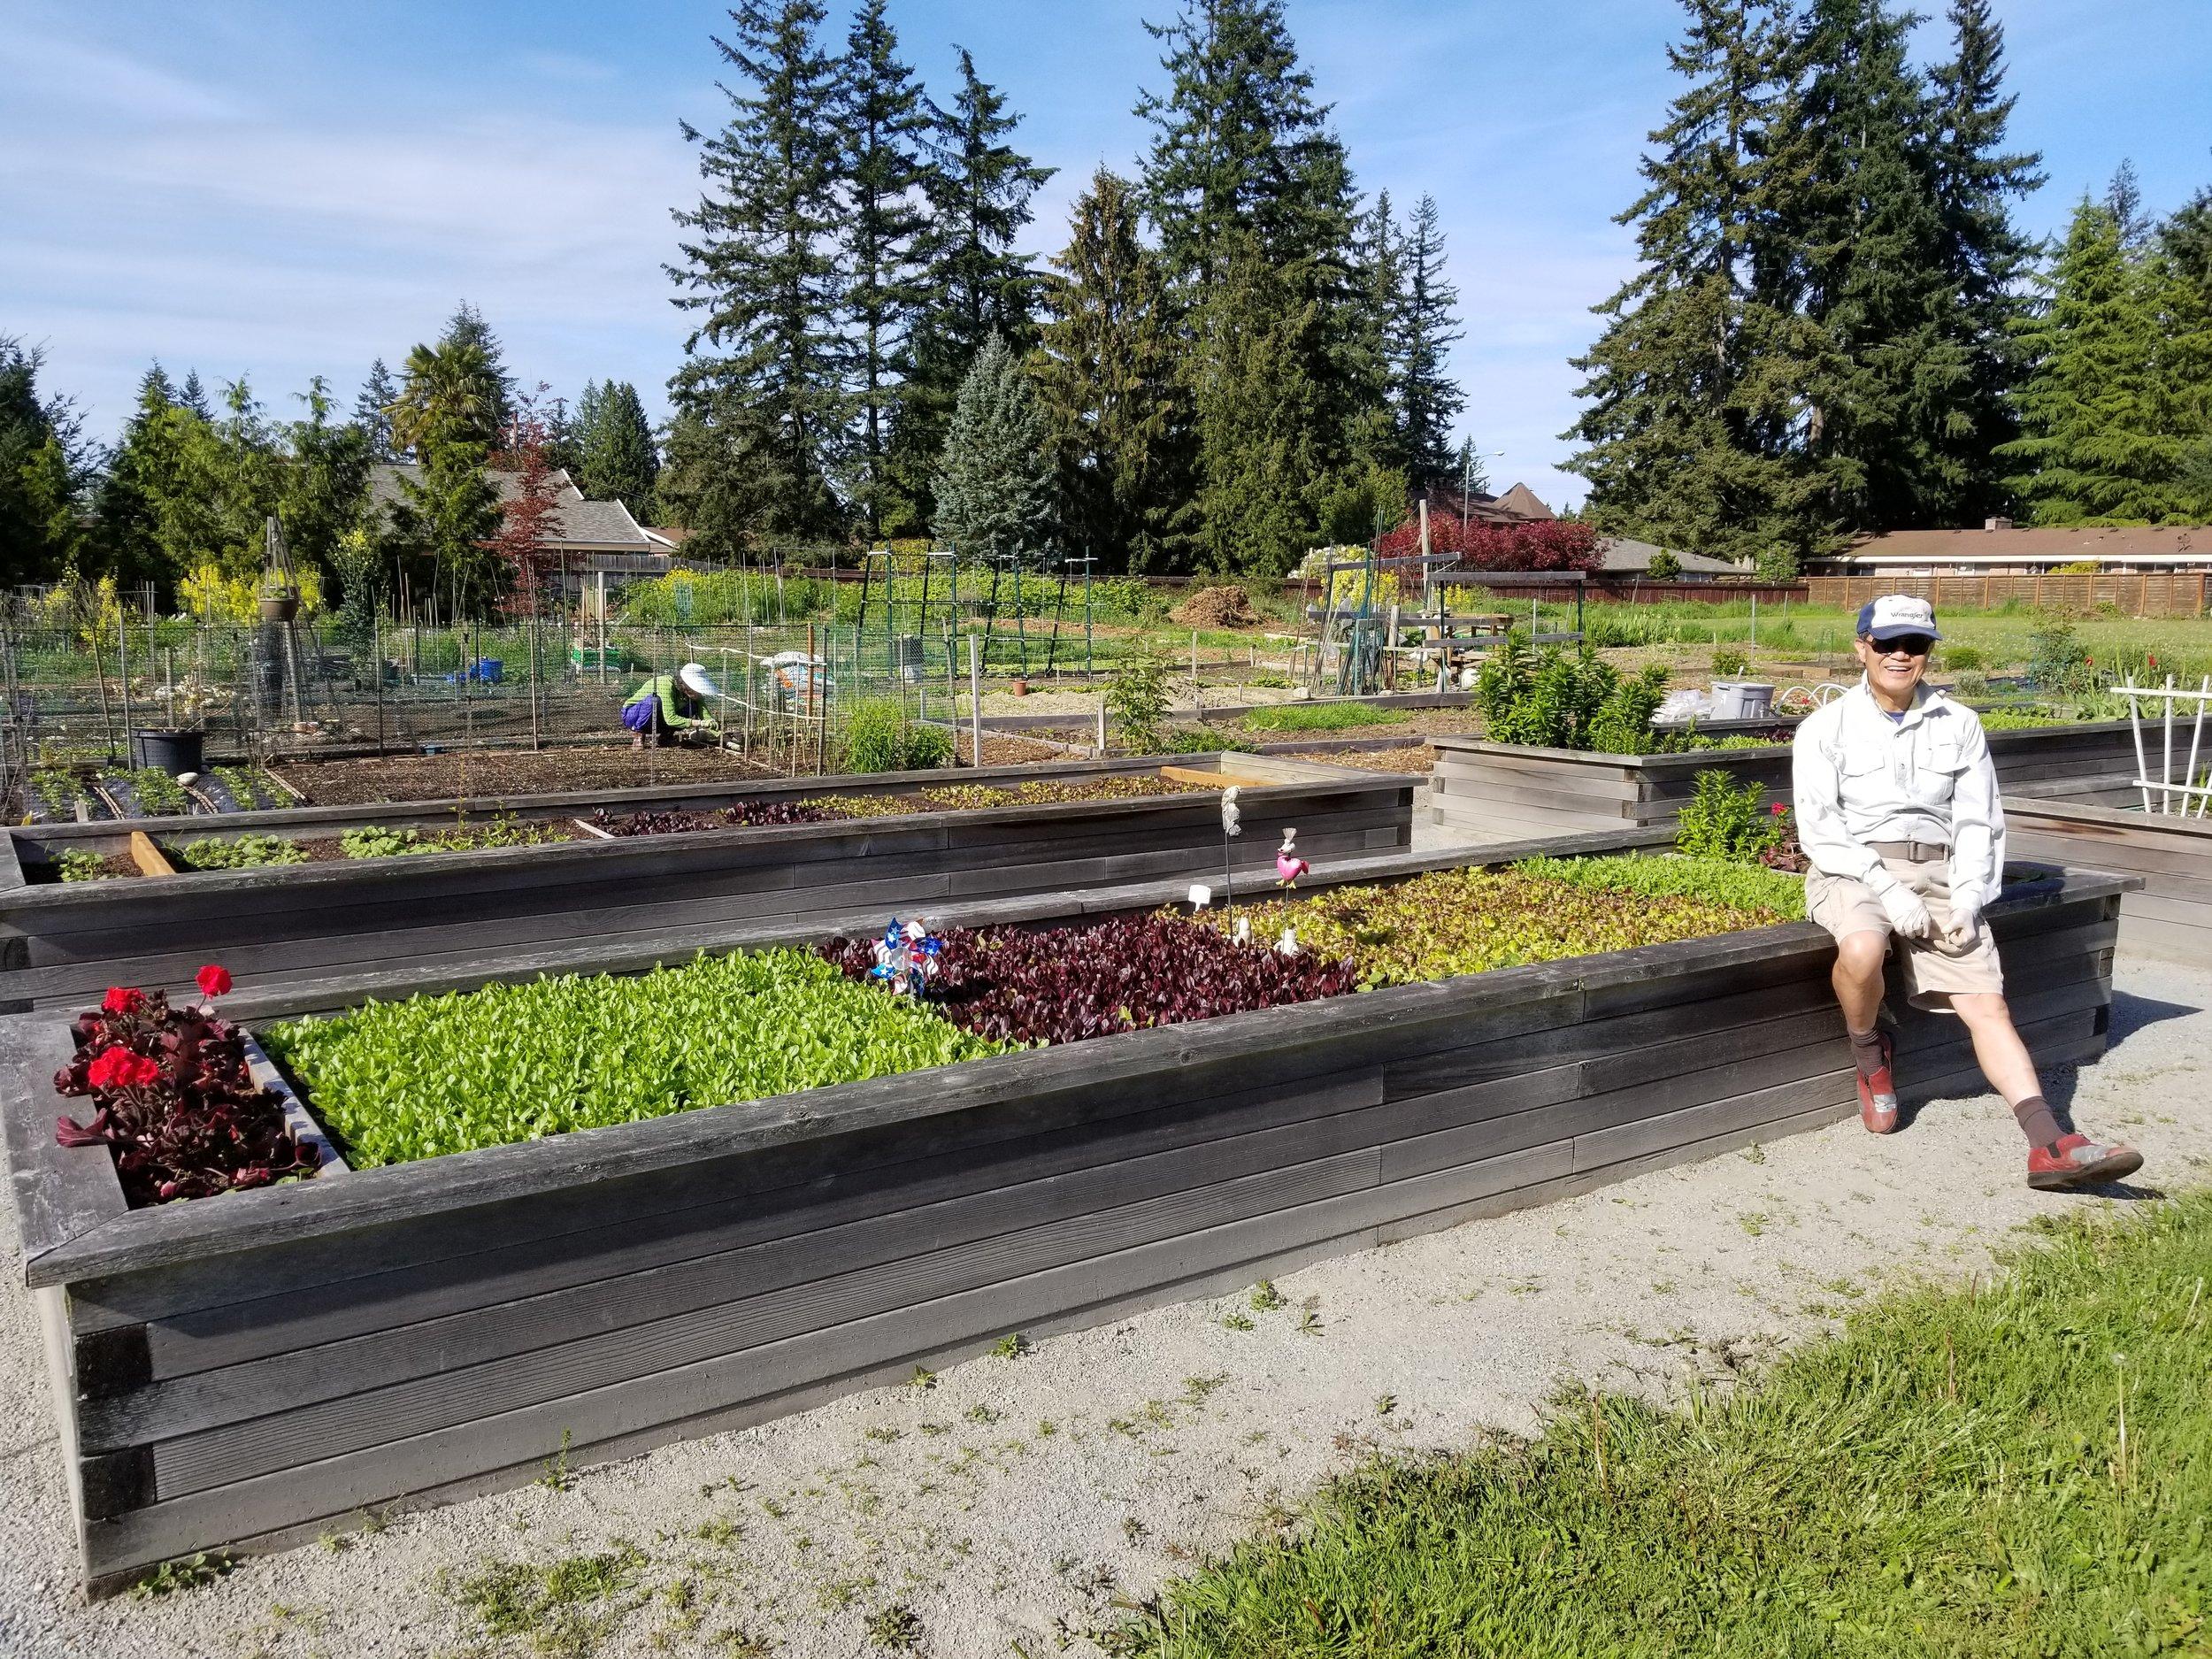 Lawns to Lettuce